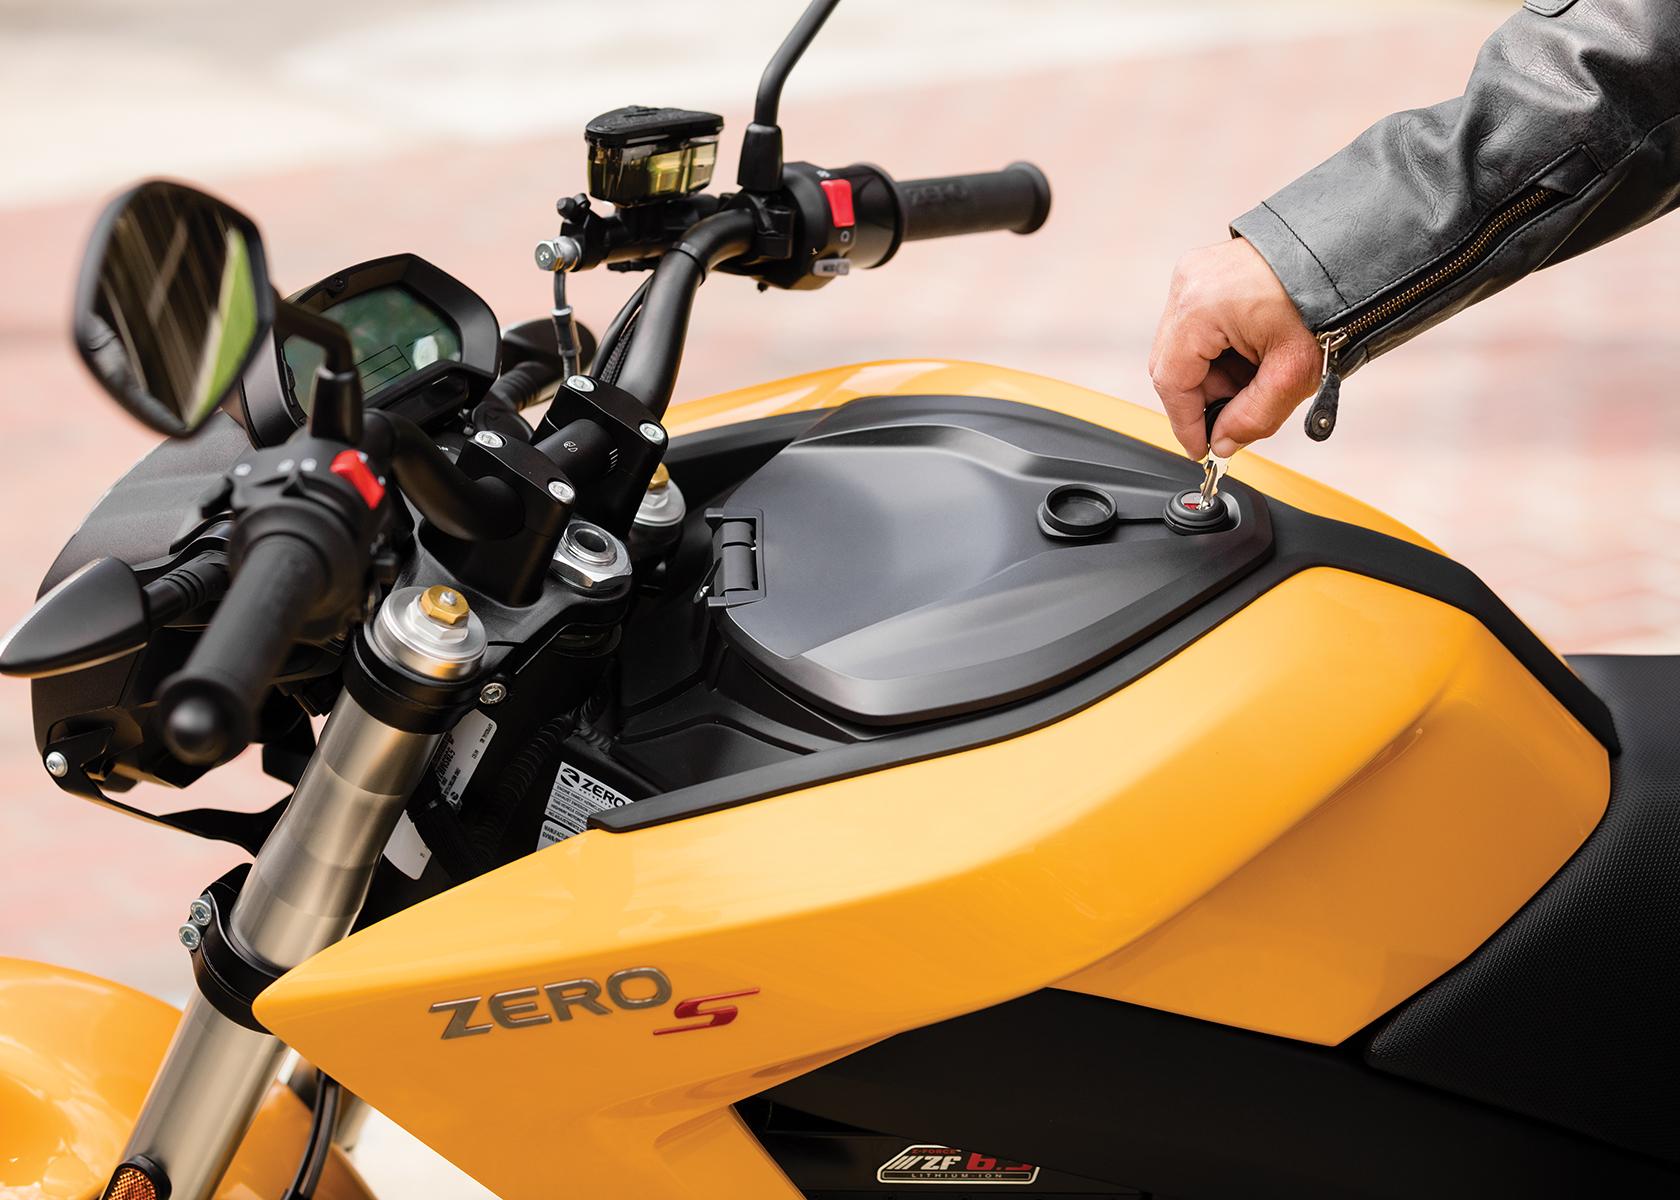 Zero S Streetfighter (2017) - MotorcycleSpecifications.com